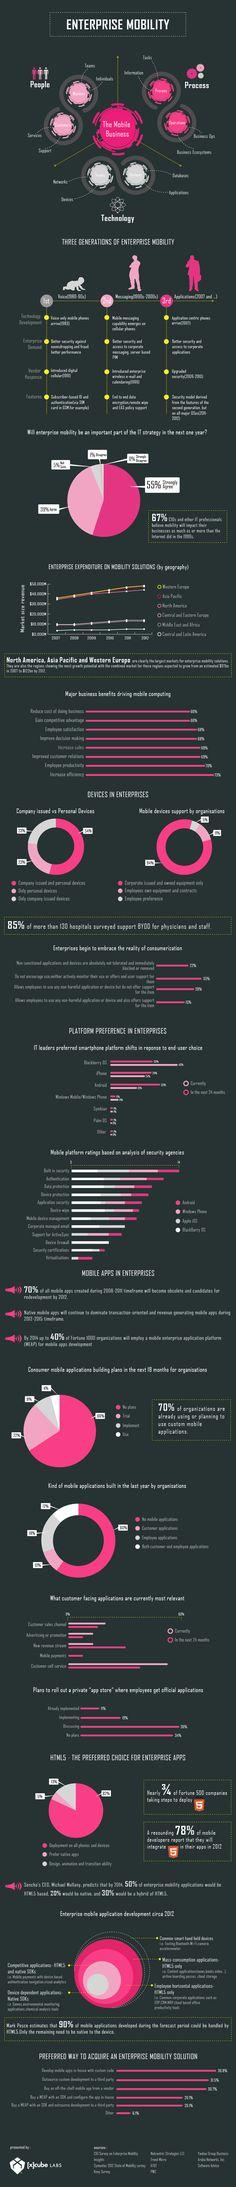 Enterprise-Mobility-infographic